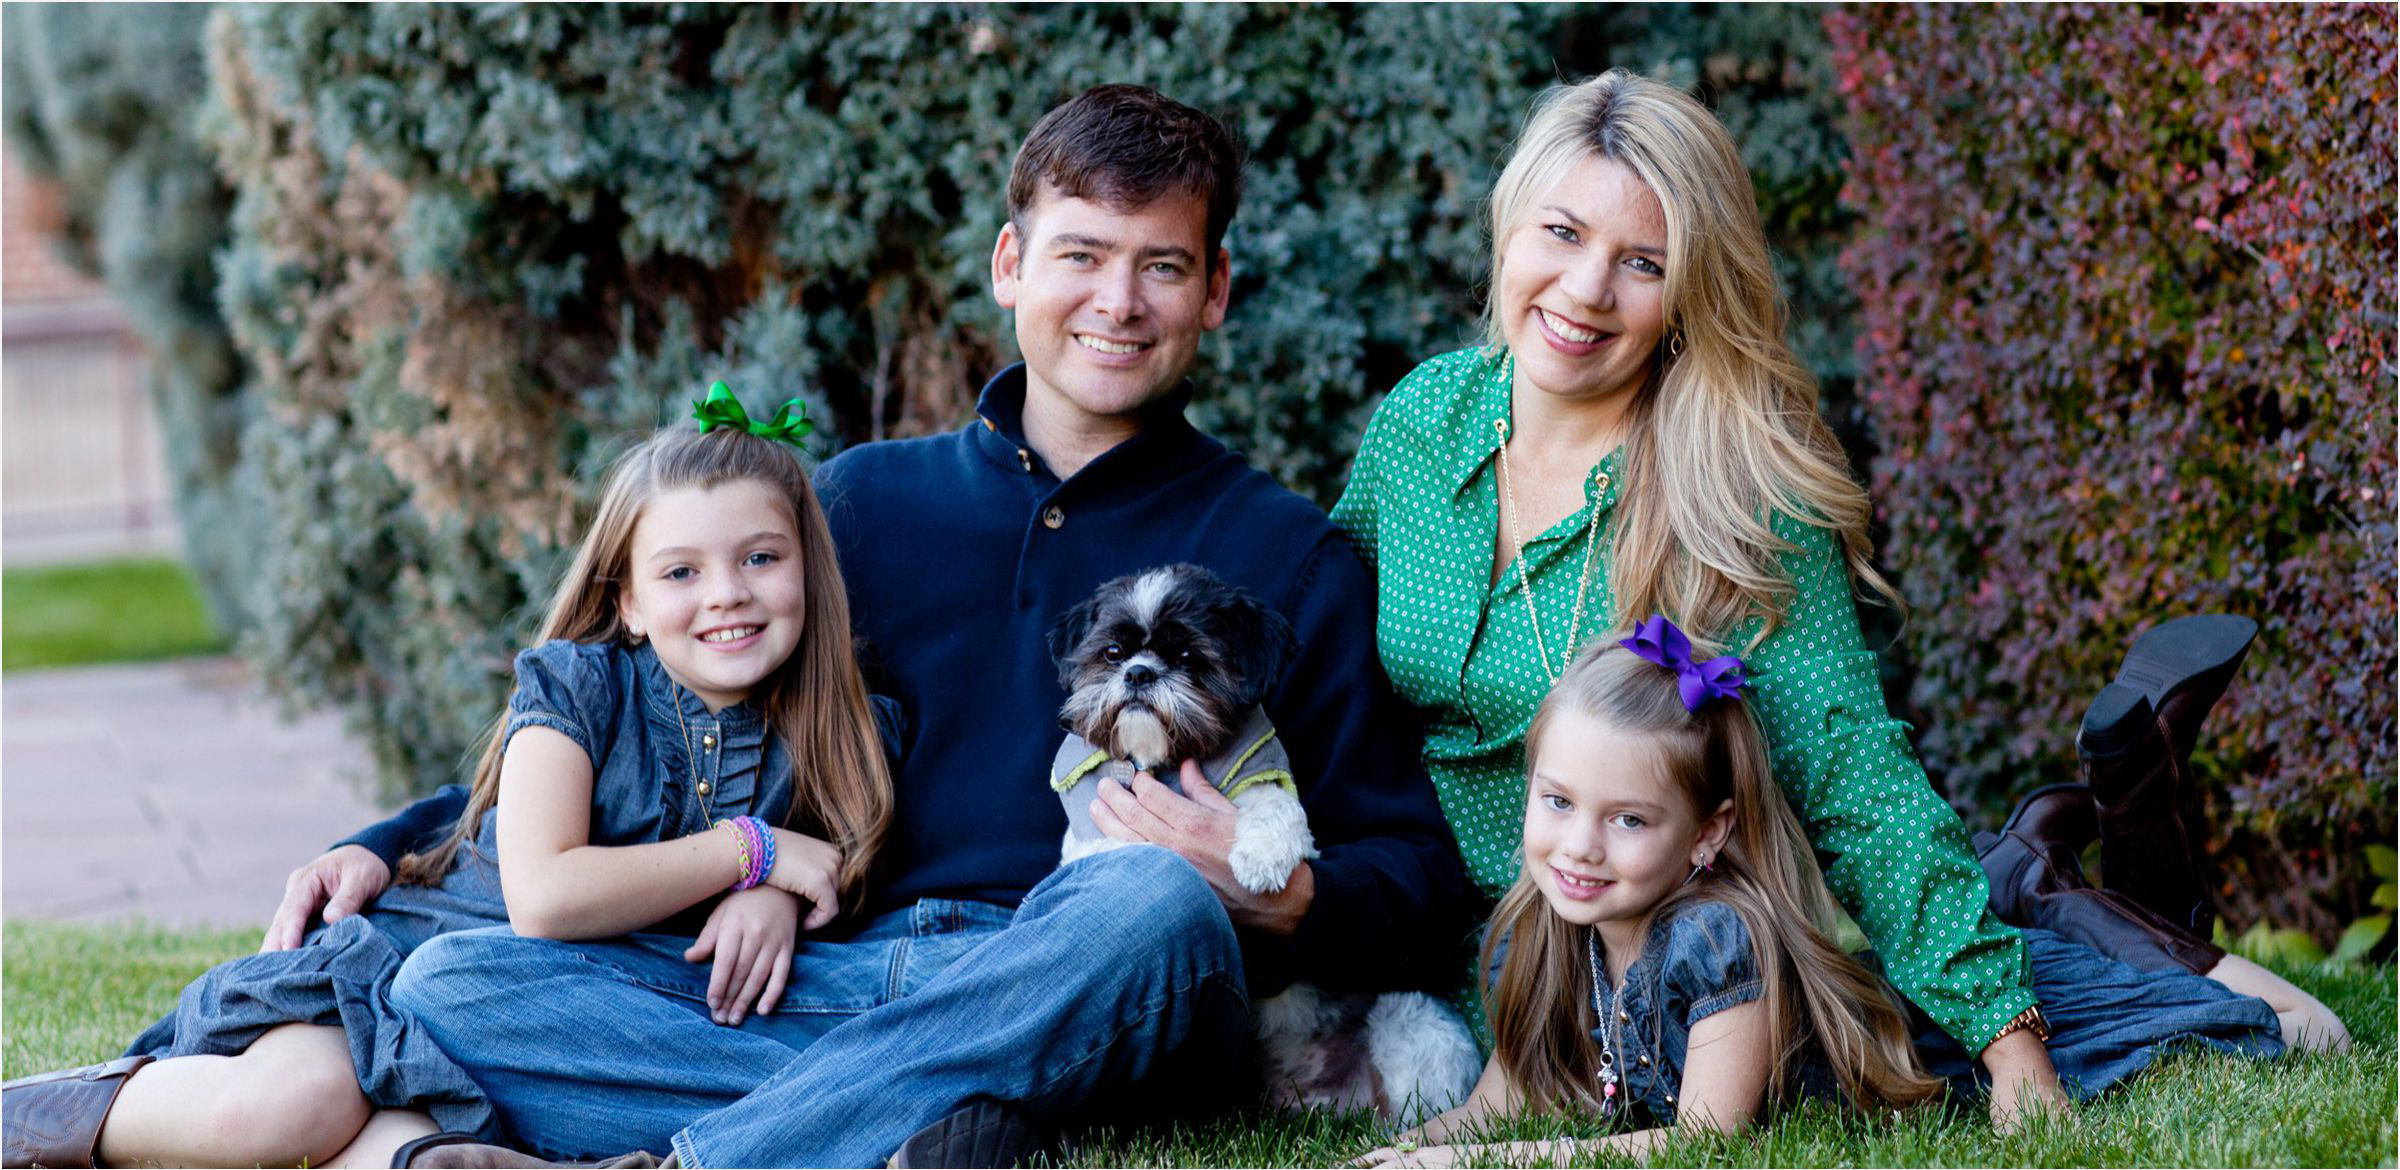 Denver-University-family-portrait-session-cozy-up-with-your-dog-004